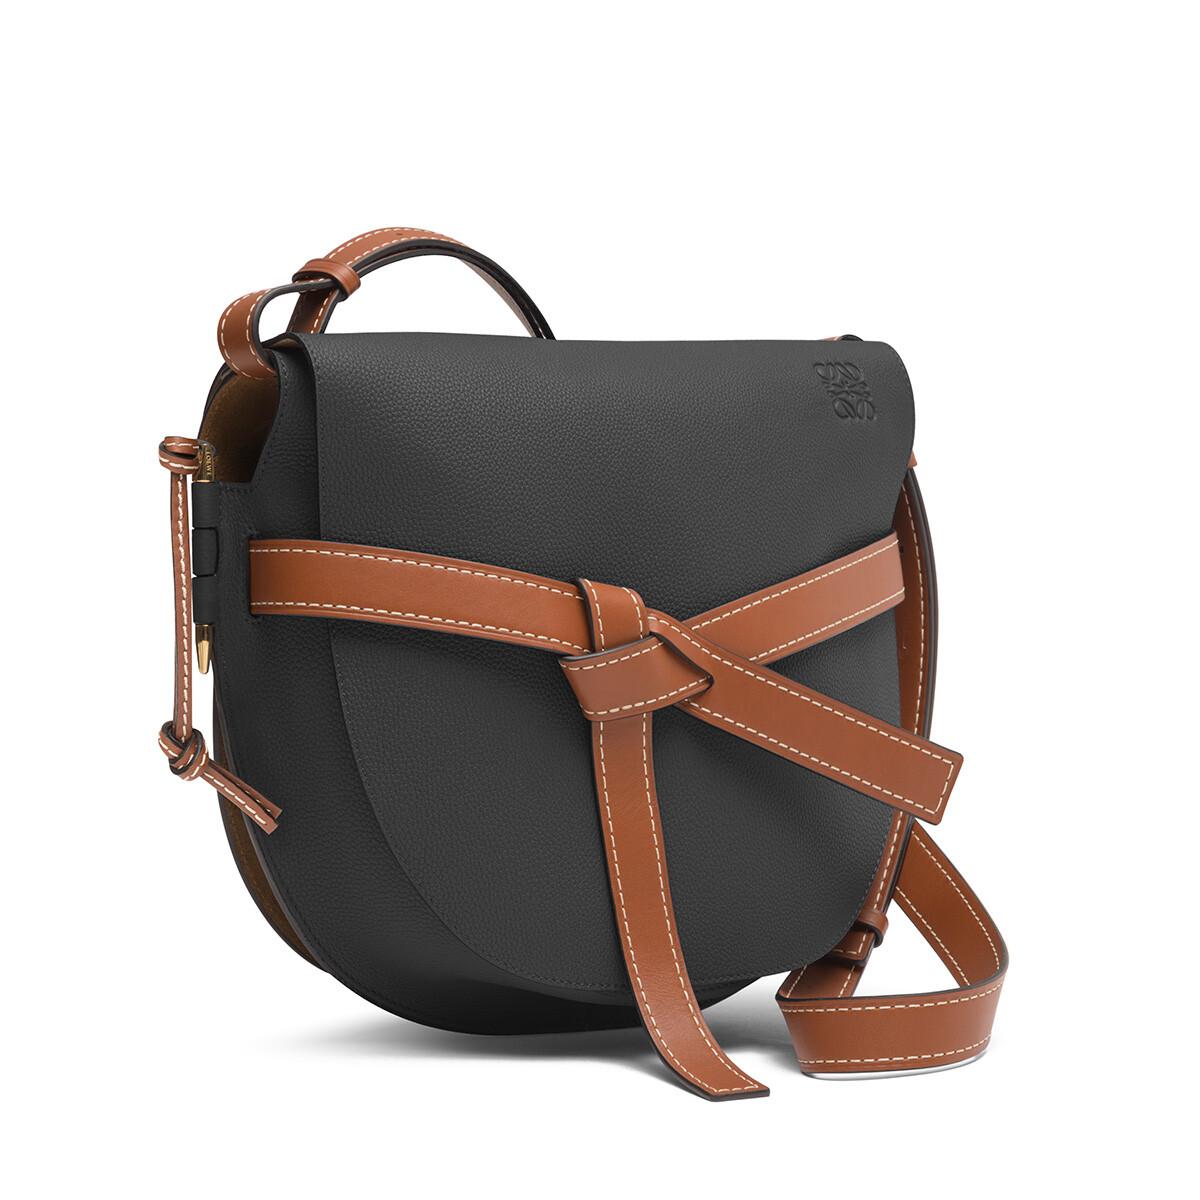 LOEWE Gate Bag Black/Pecan front